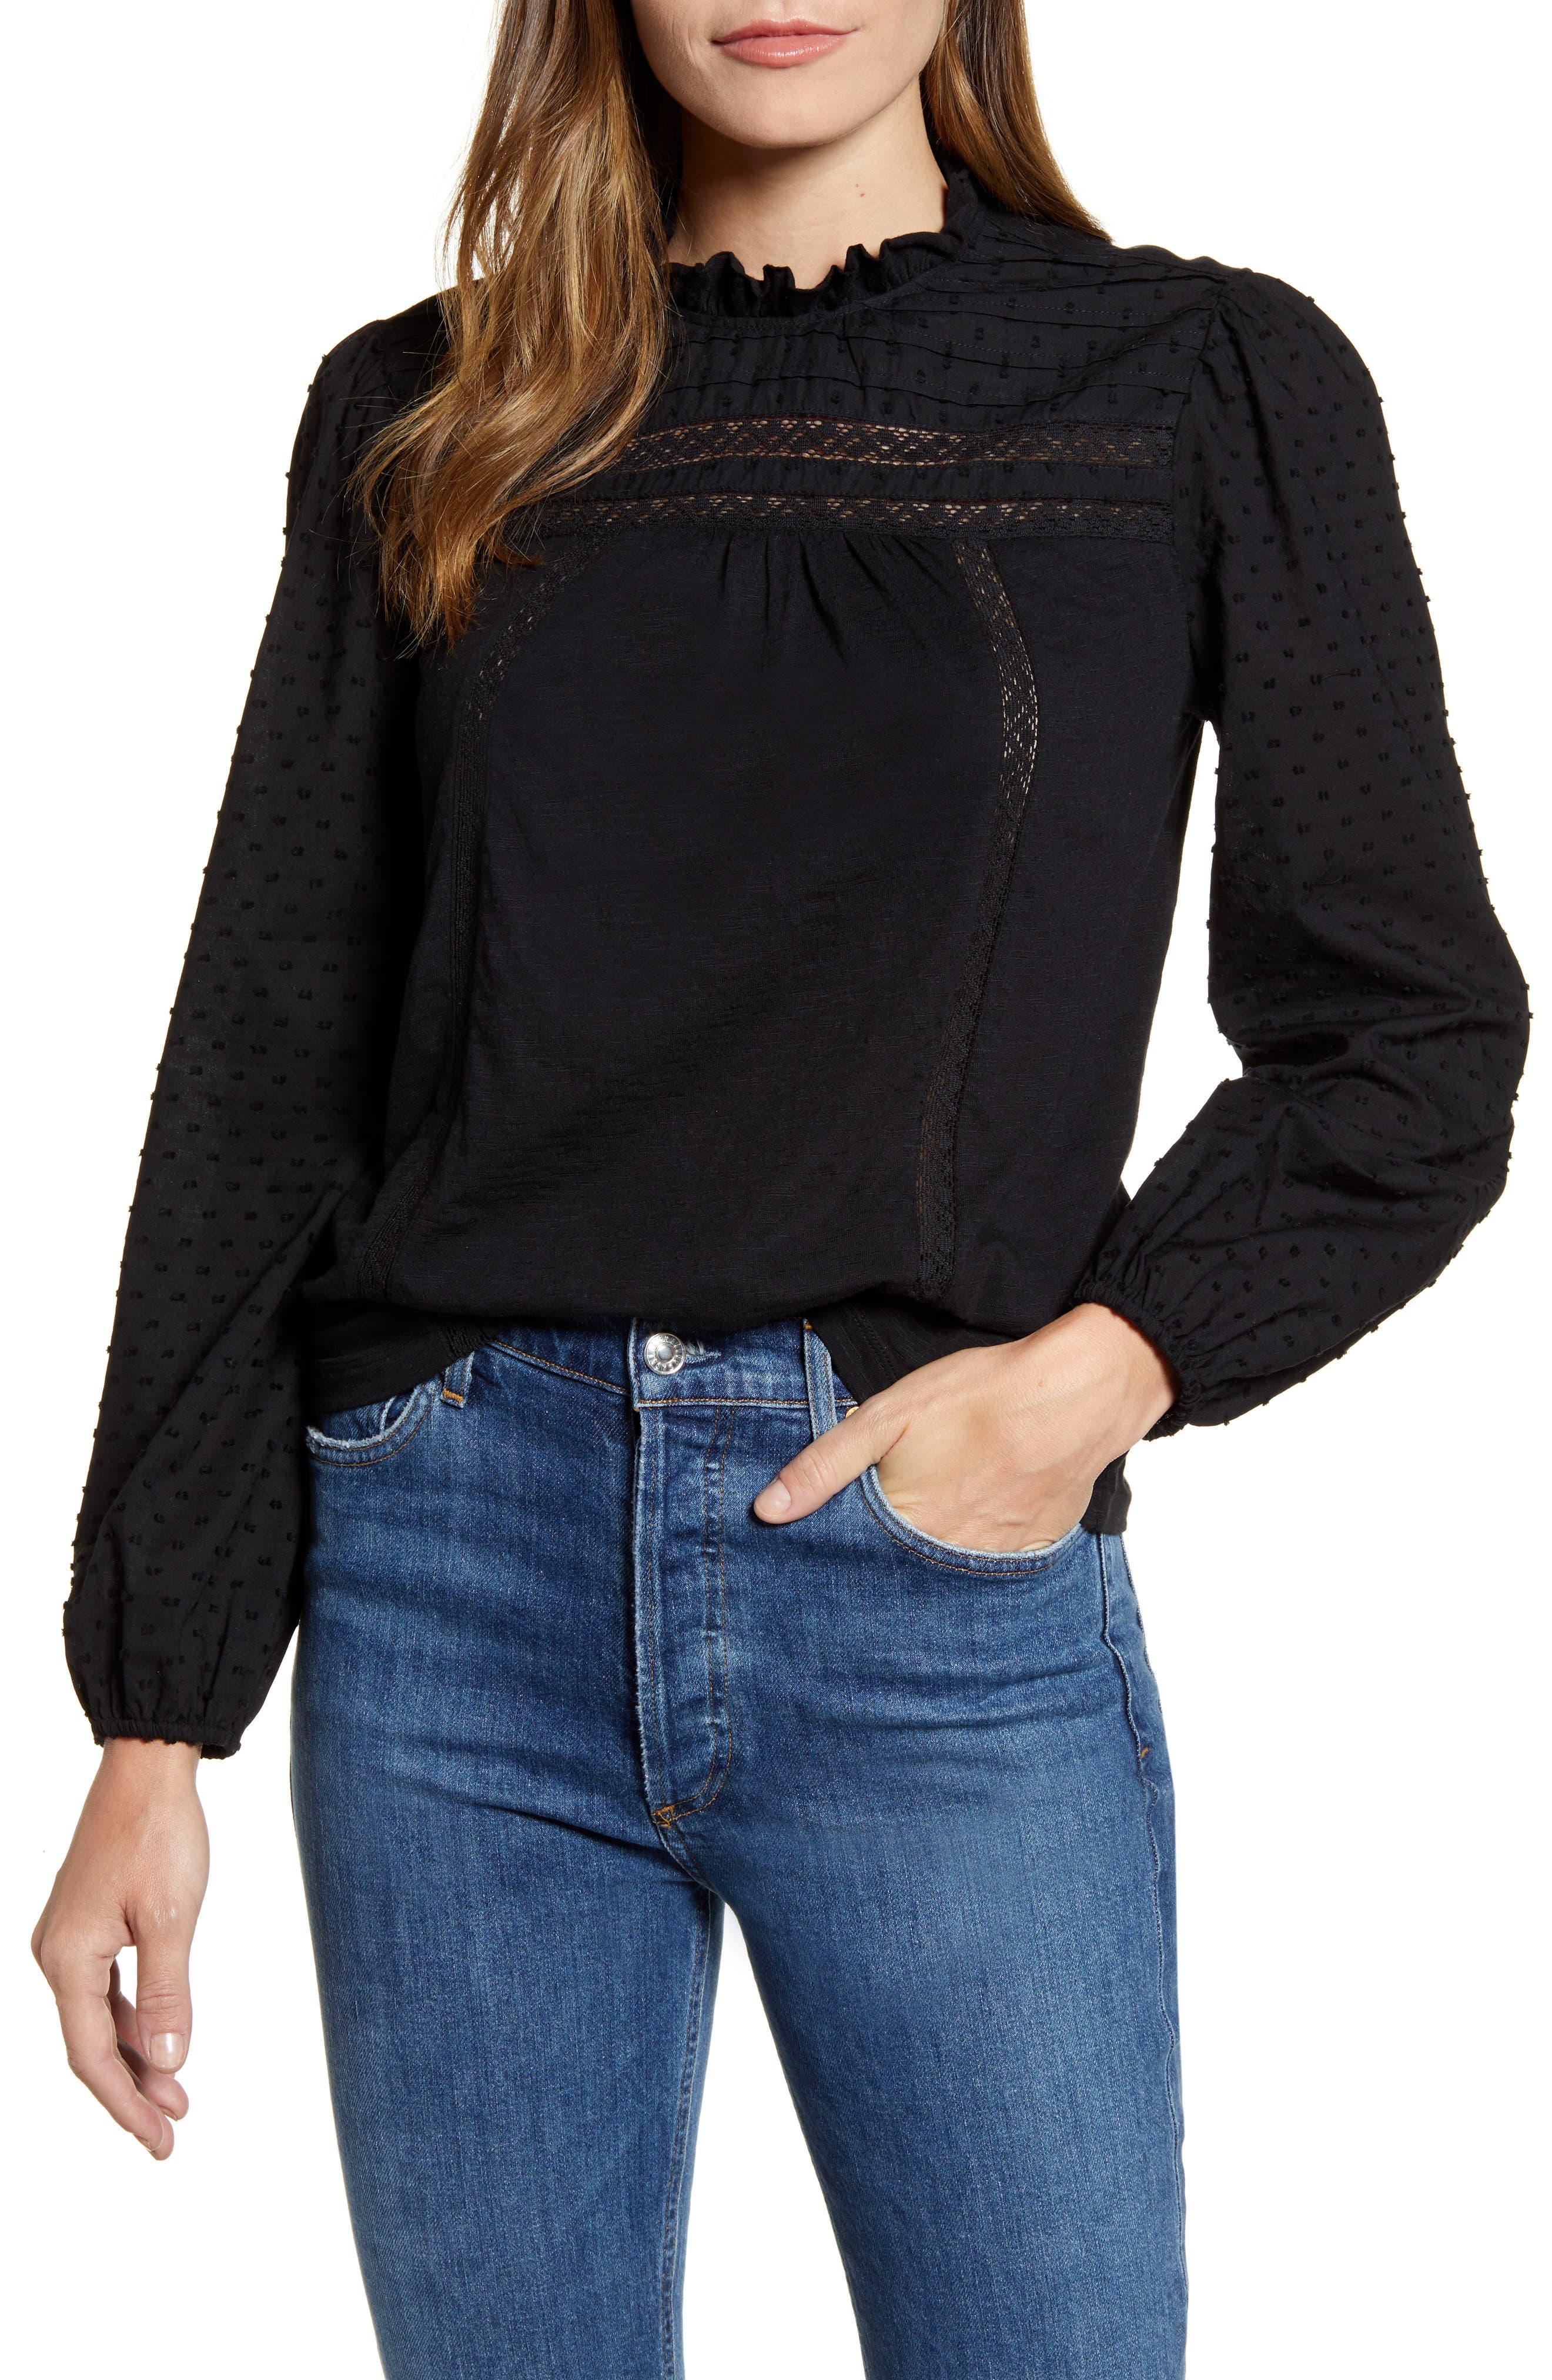 Victorian Blouses, Tops, Shirts, Sweaters Womens Caslon Pintuck Lace Detail Long Sleeve Cotton Blouse $35.00 AT vintagedancer.com